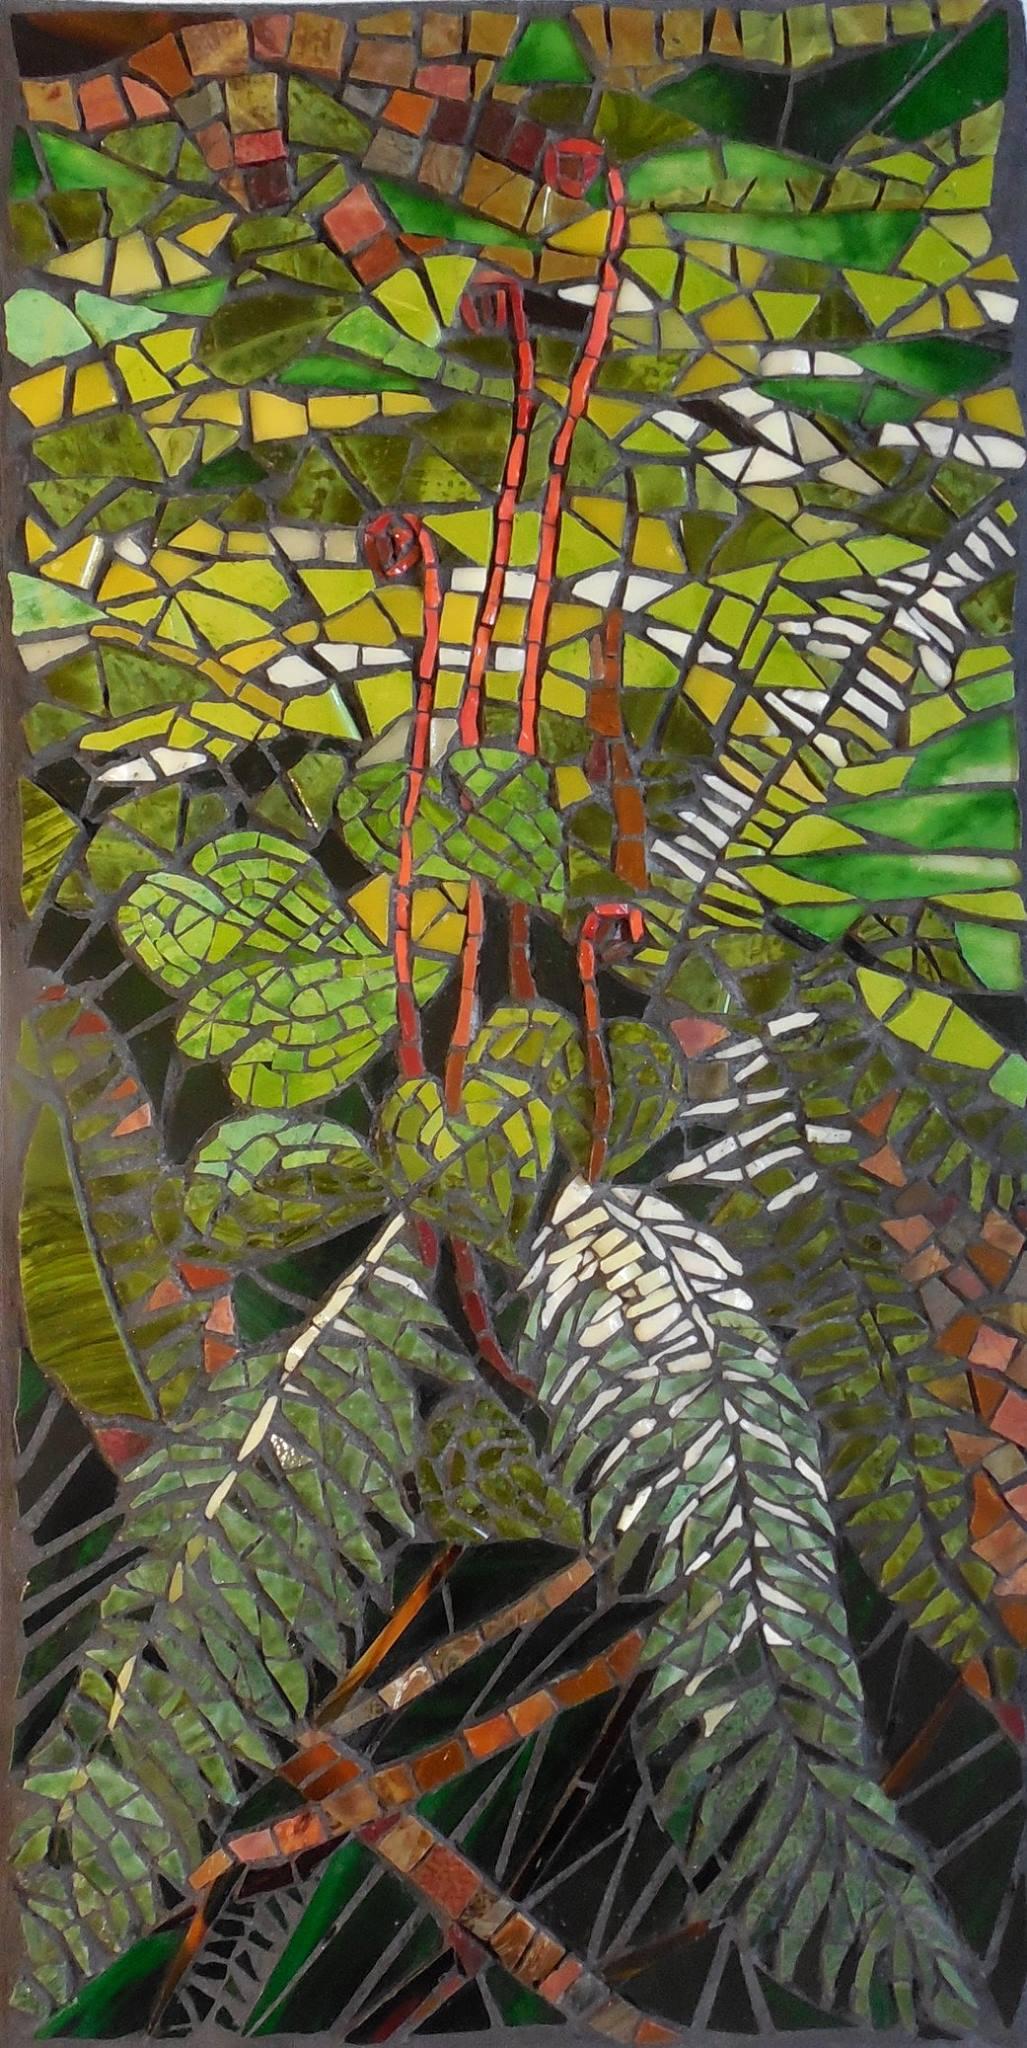 peach mosaic by Joanne Daschel